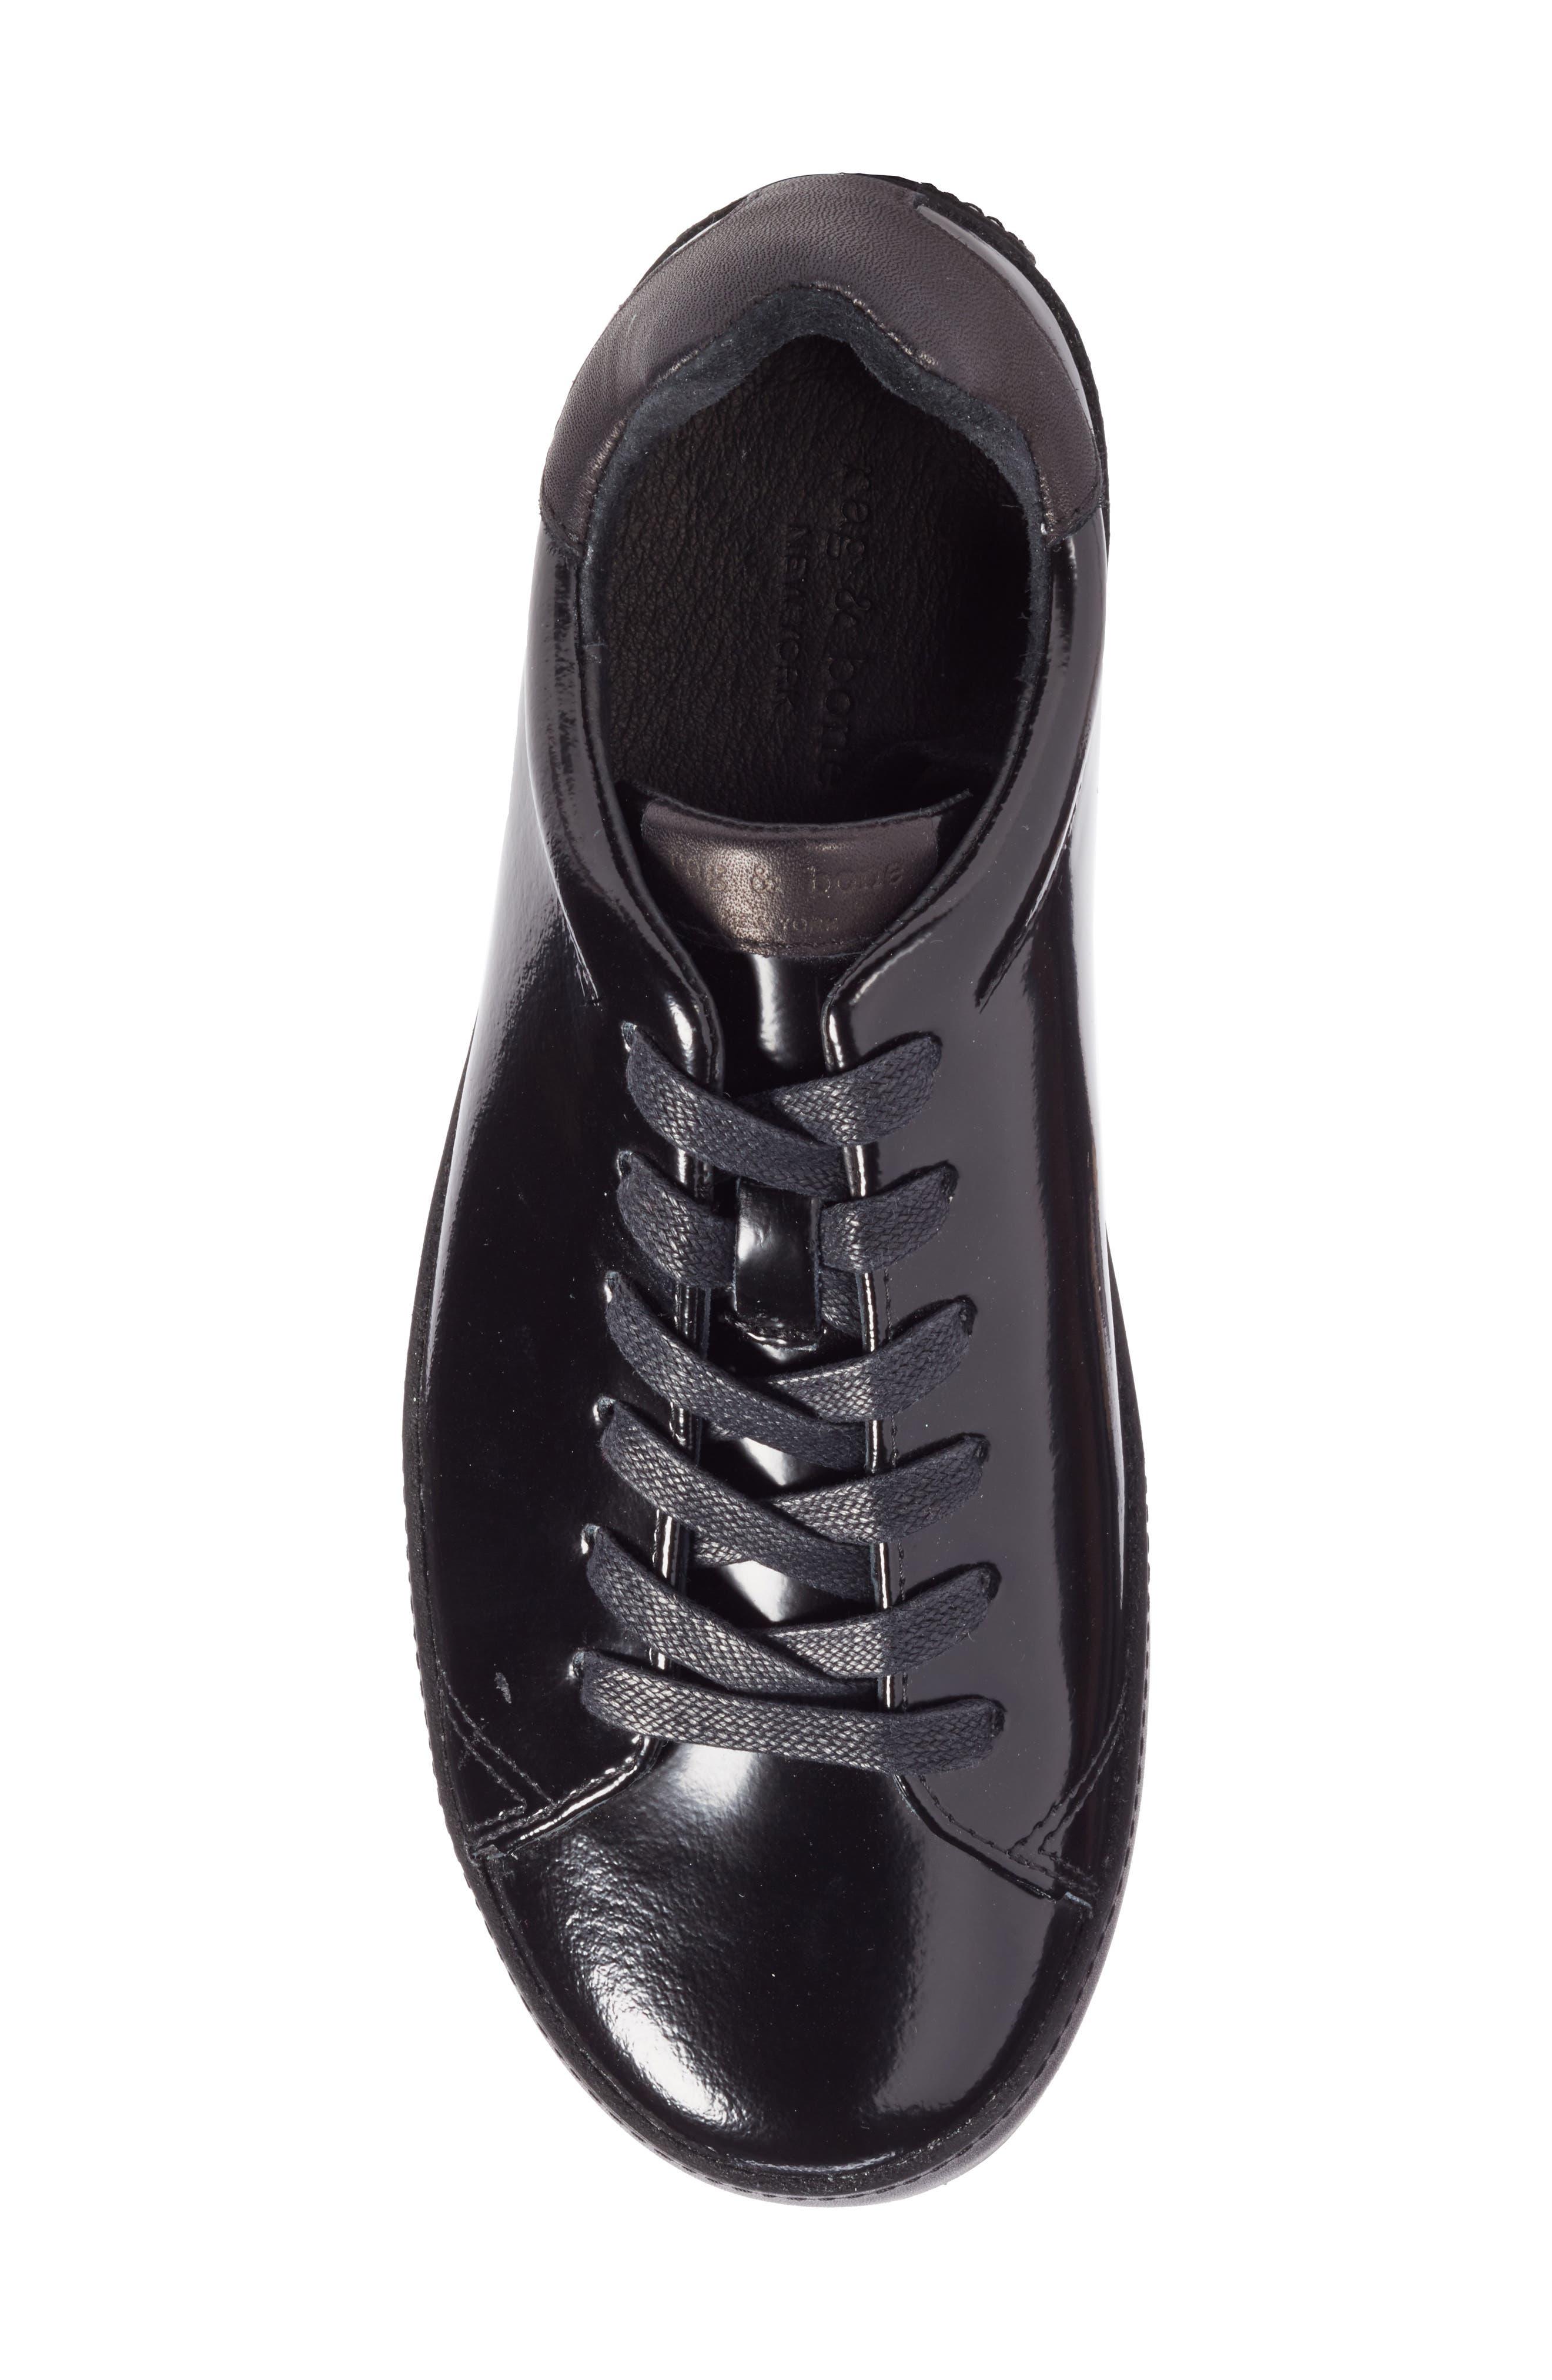 RB1 Low-Top Sneaker,                             Alternate thumbnail 5, color,                             001